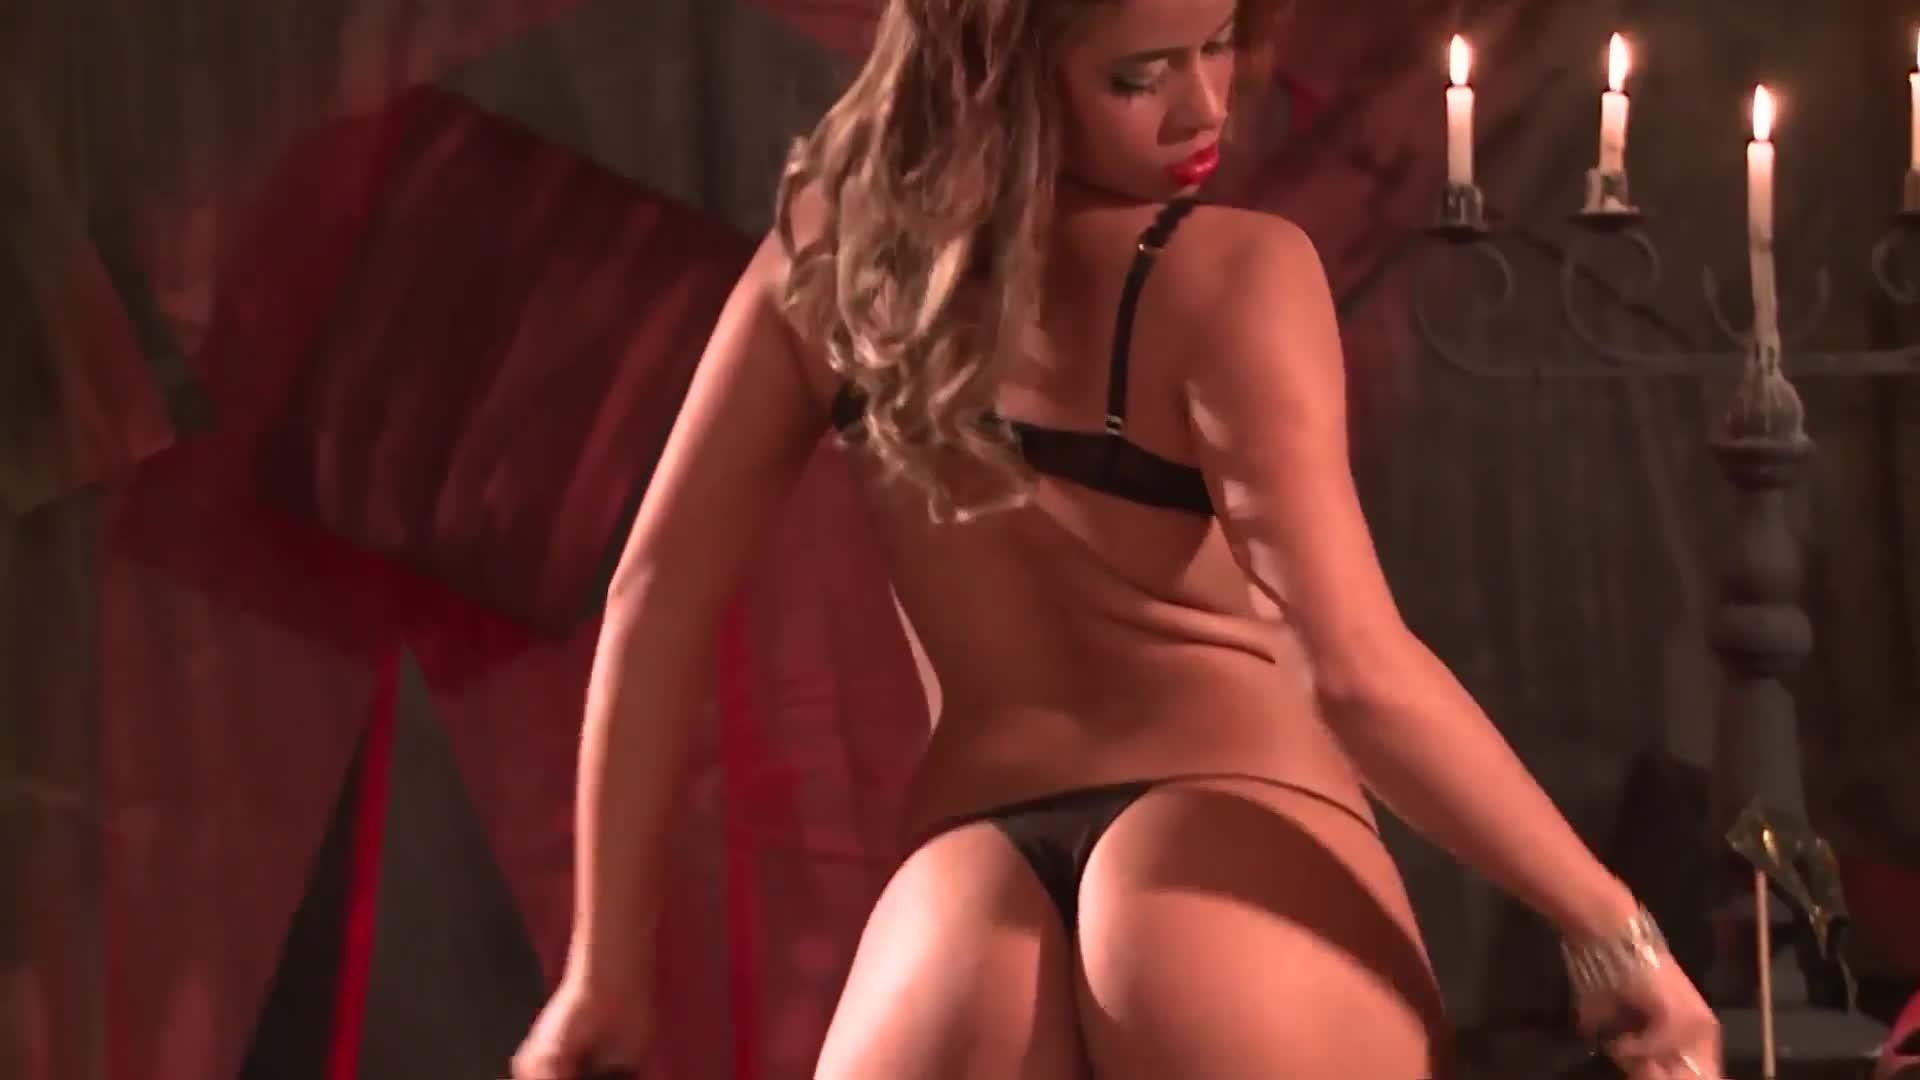 Brazilian Woman - Lola